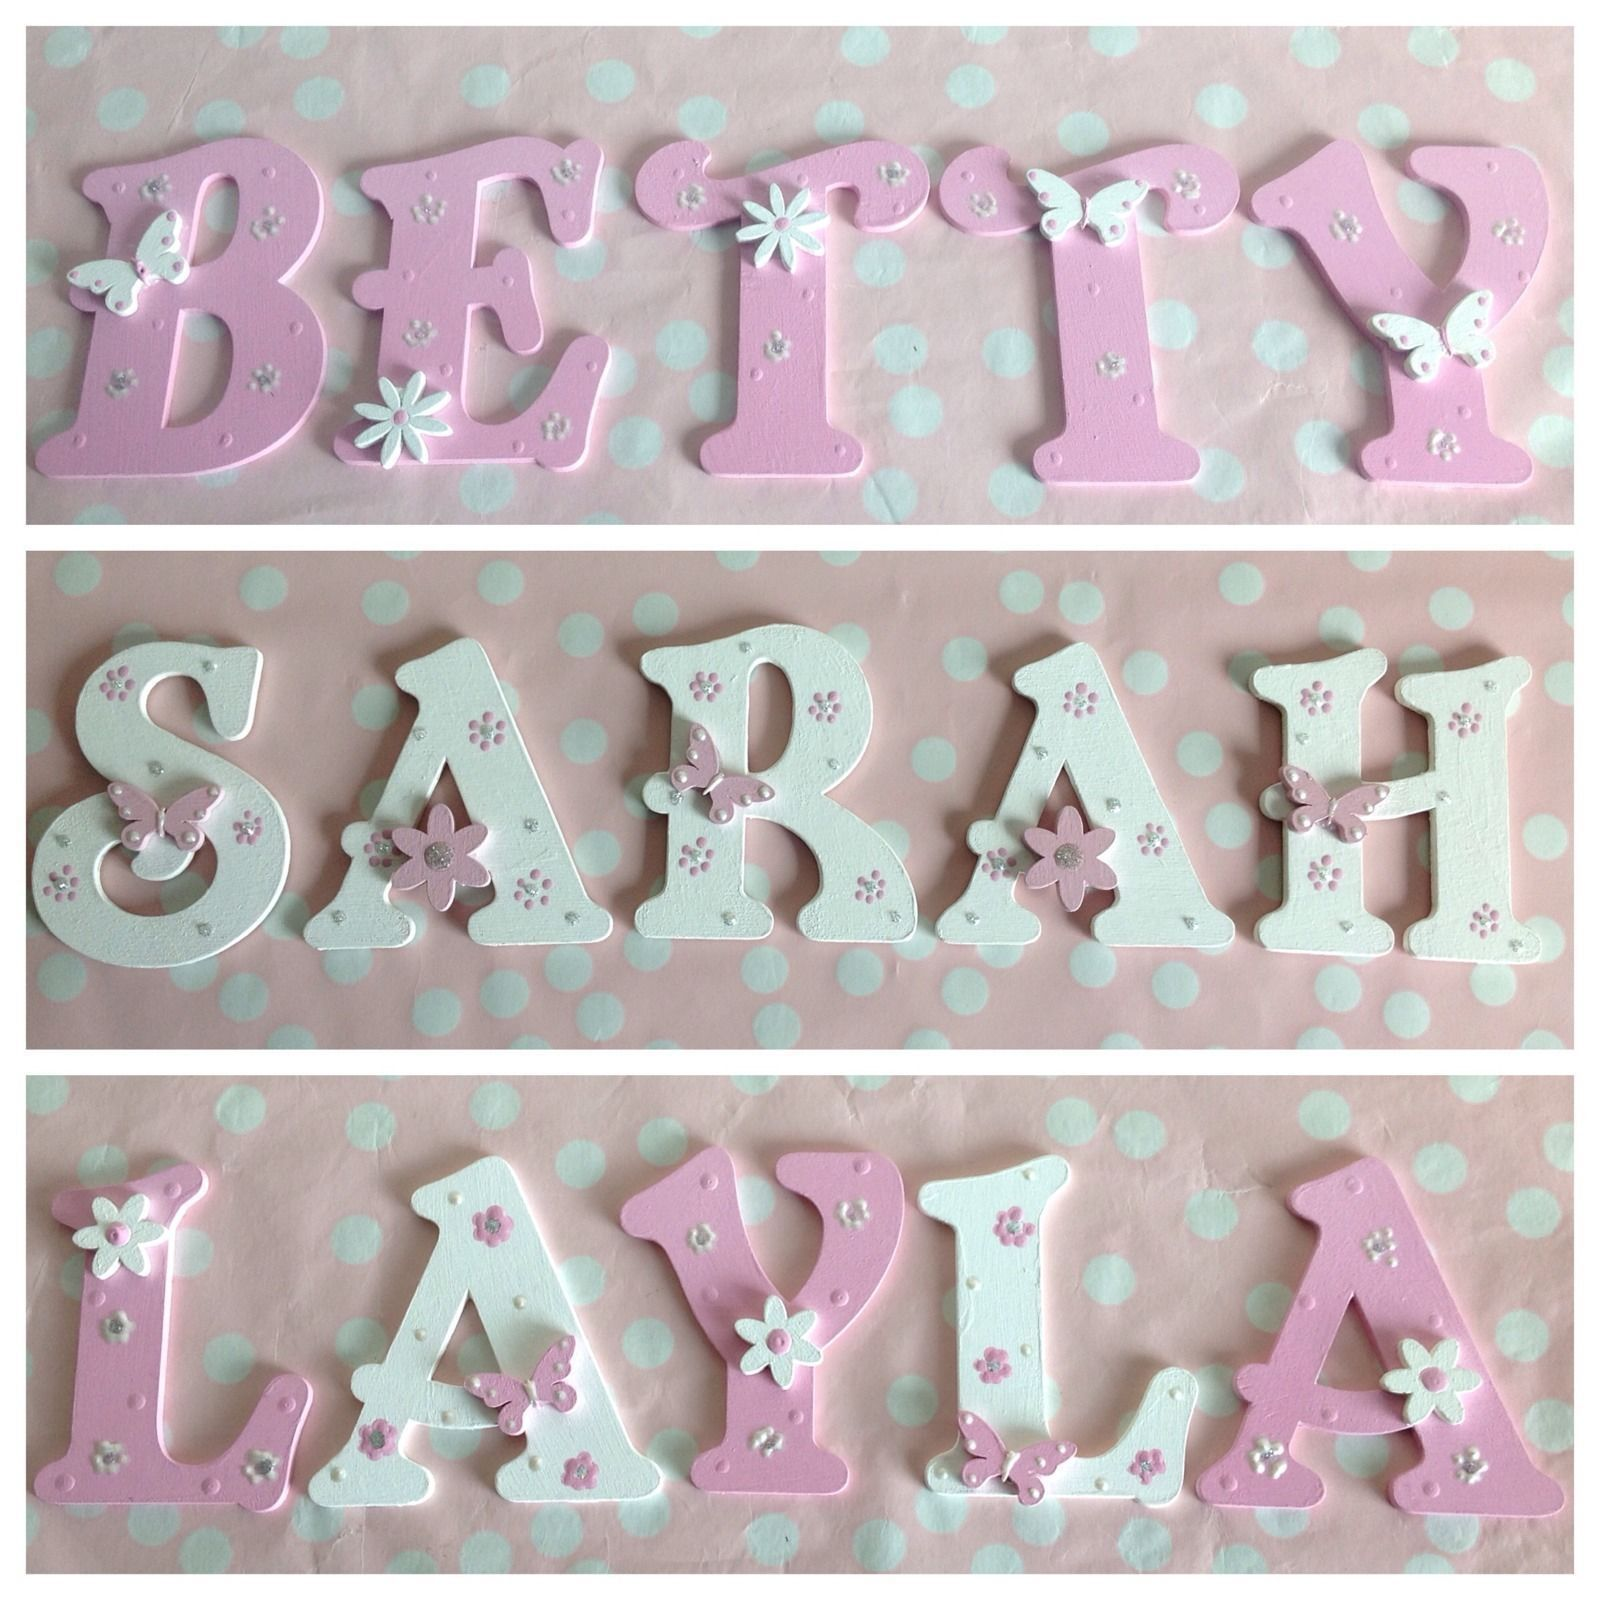 Personalised Child Kids Bedroom Wall Door Wooden Letter Name